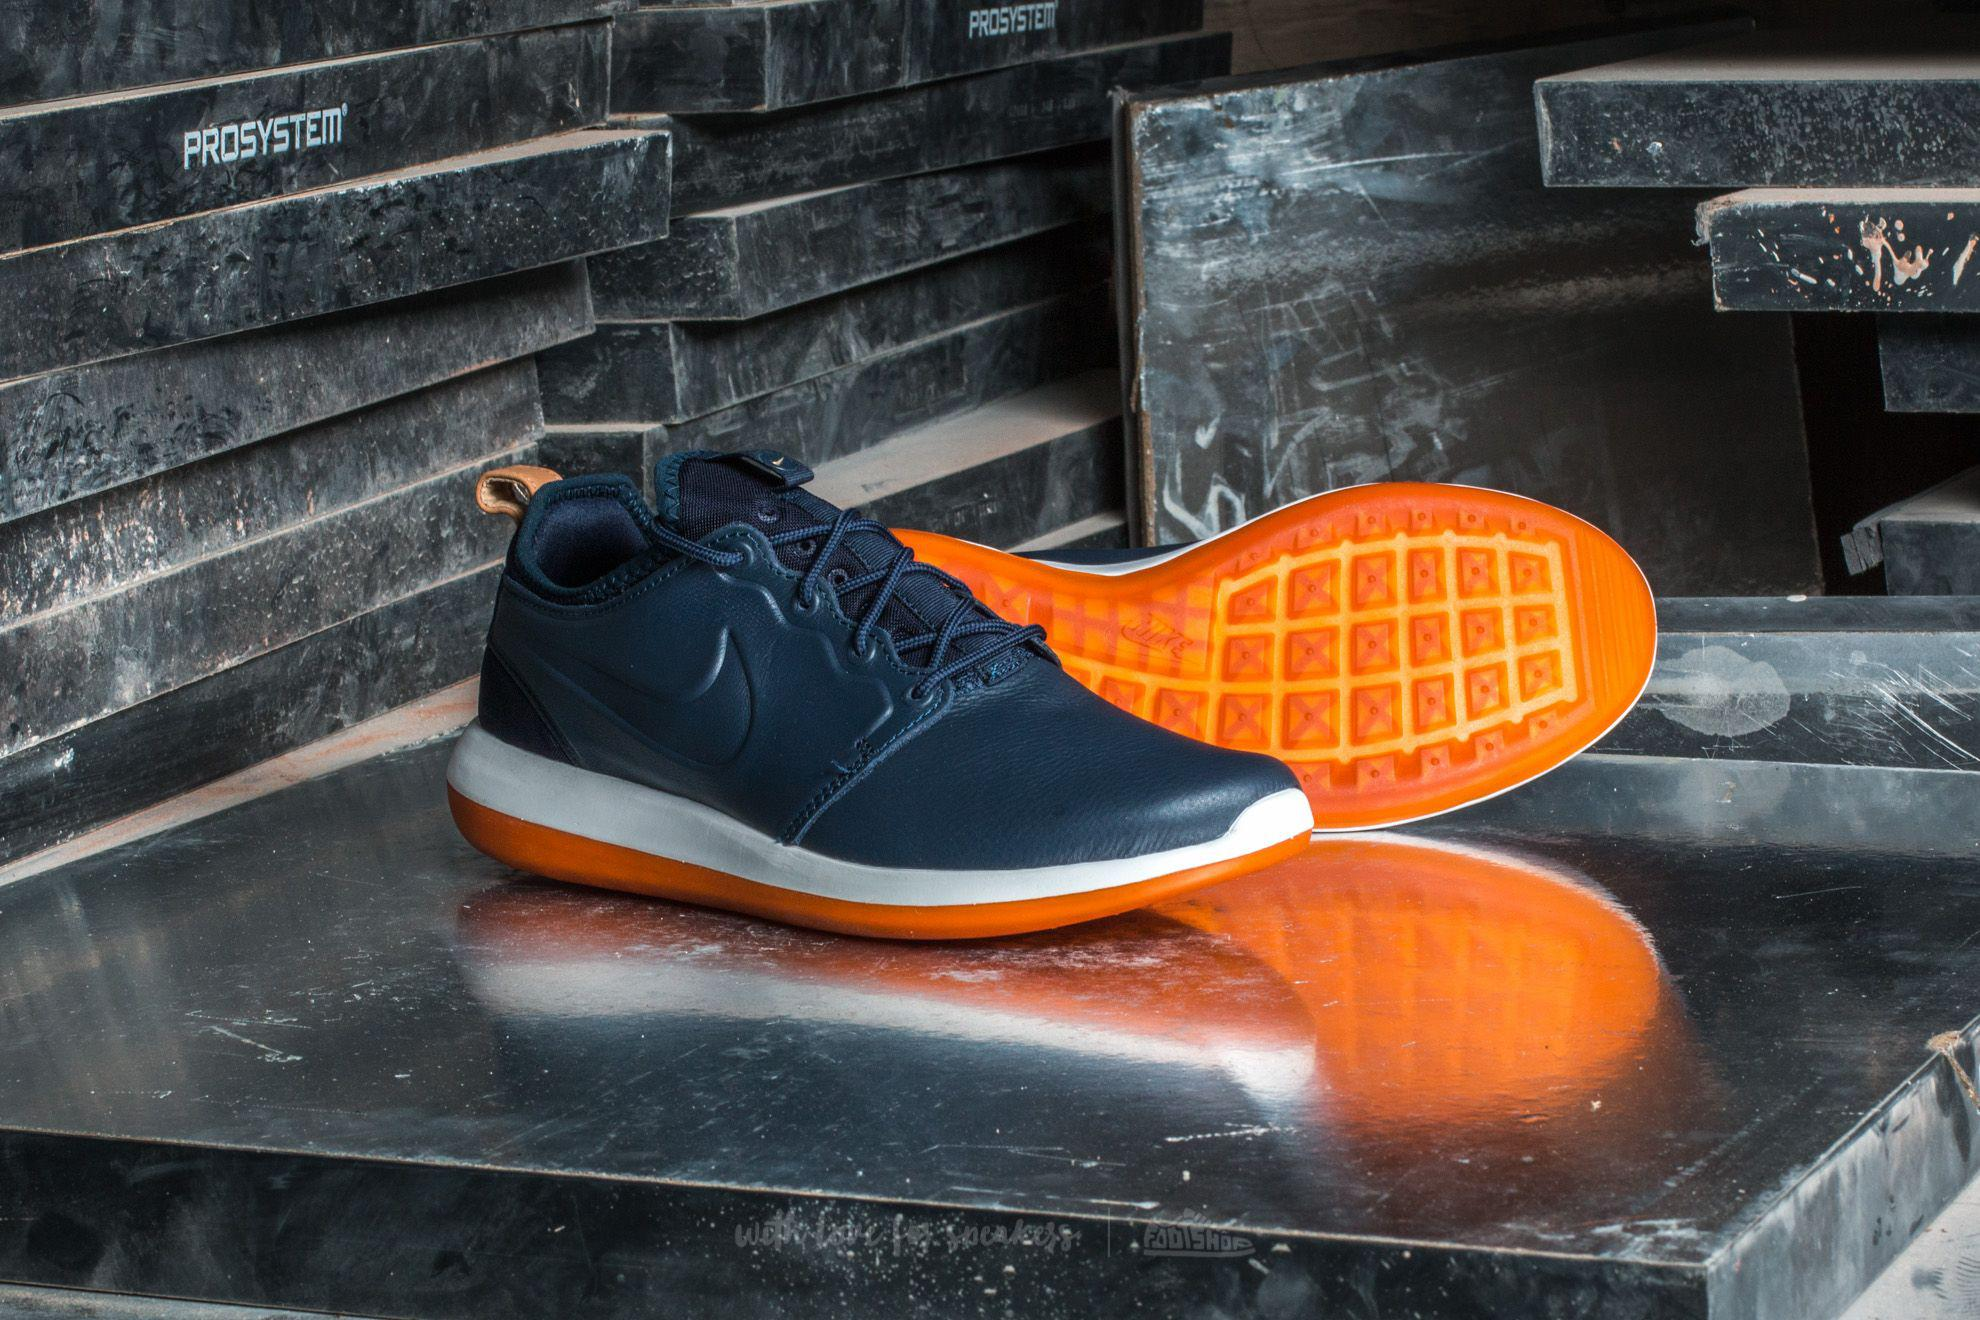 840cf0044670 Lyst - Nike Roshe Two Leather Premium Obsidian  Obsidian-white in ...